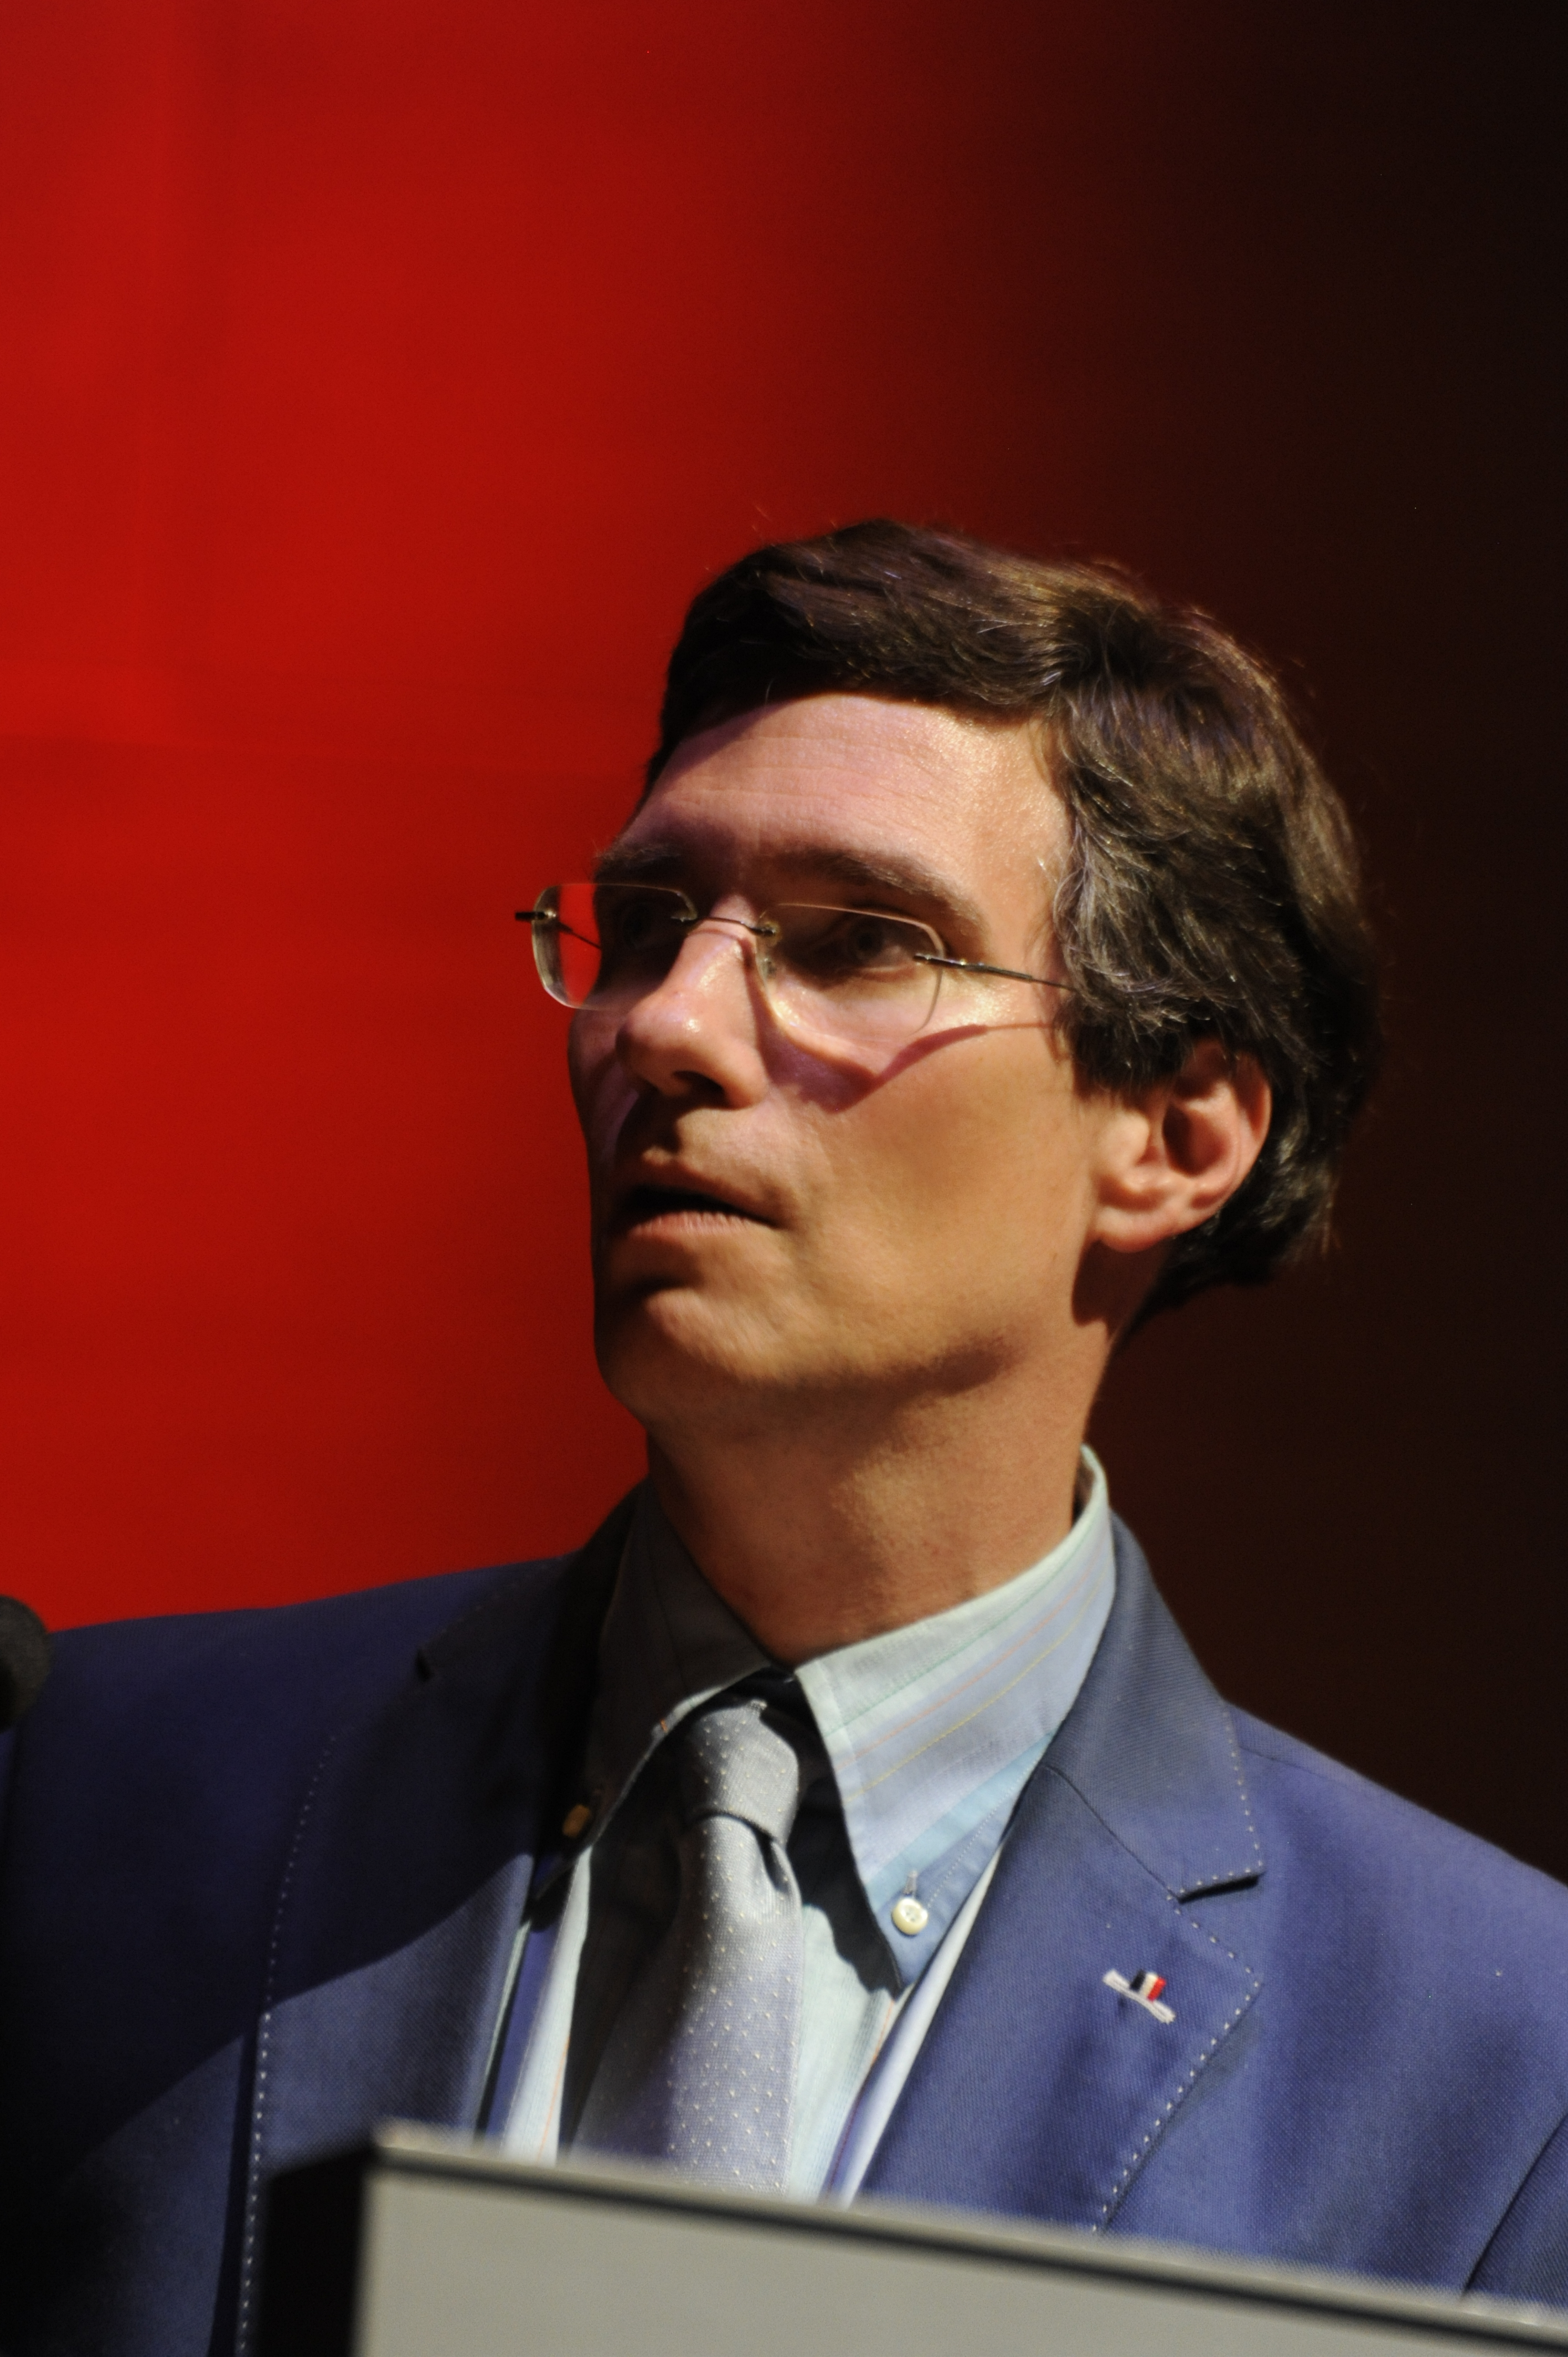 Darius A. Spieth, Photo credit Jean-Claude Figenwald